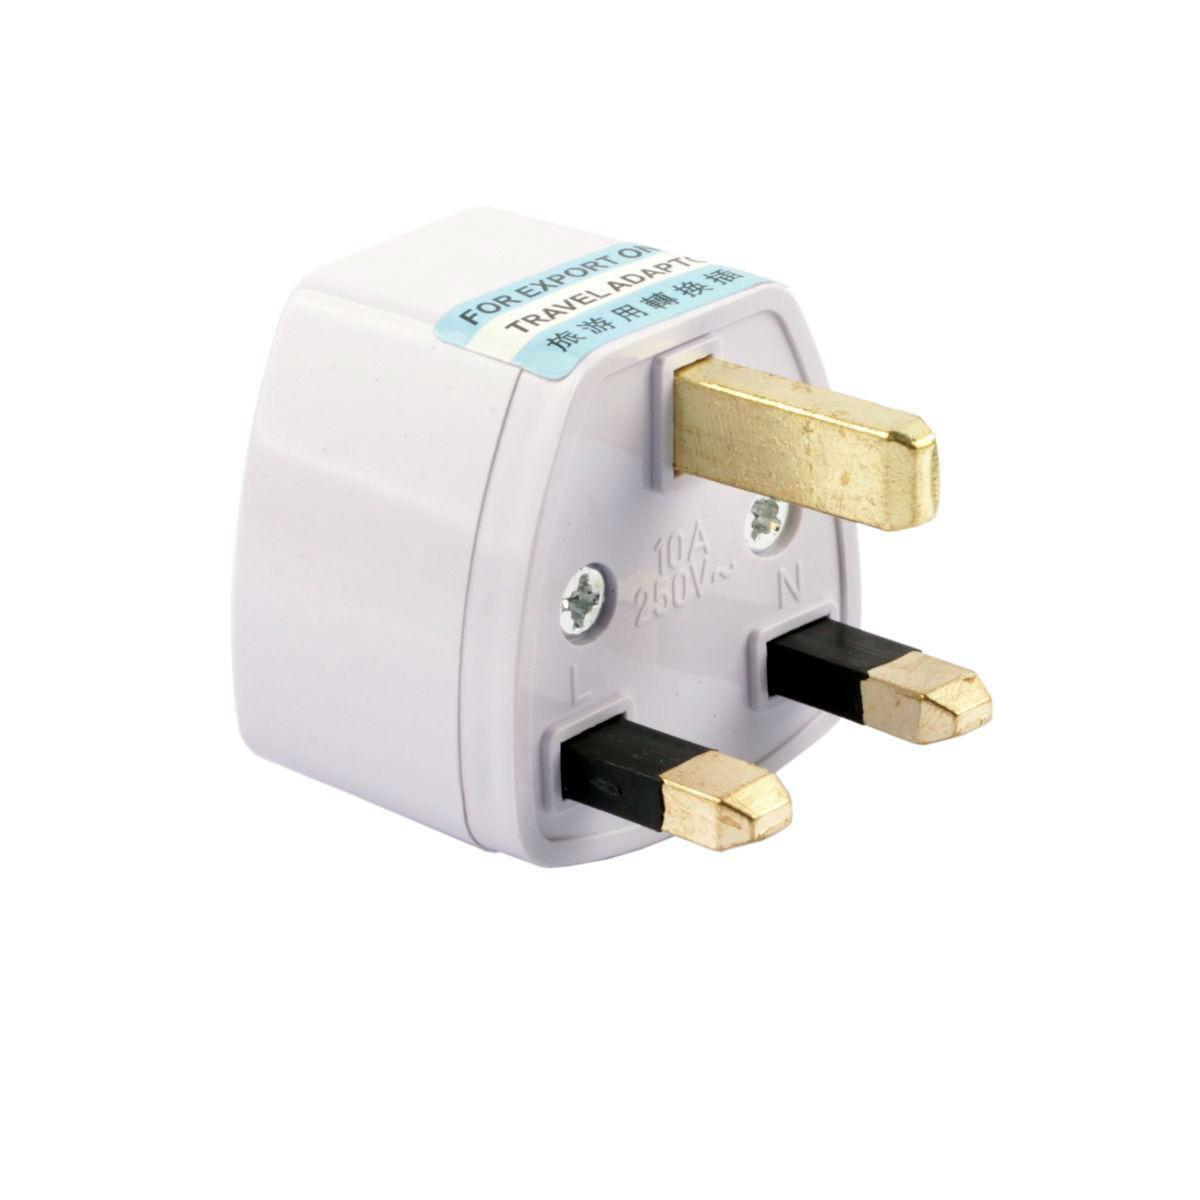 universal us au eu 2 3 pin to uk 3 pin travel power plug. Black Bedroom Furniture Sets. Home Design Ideas